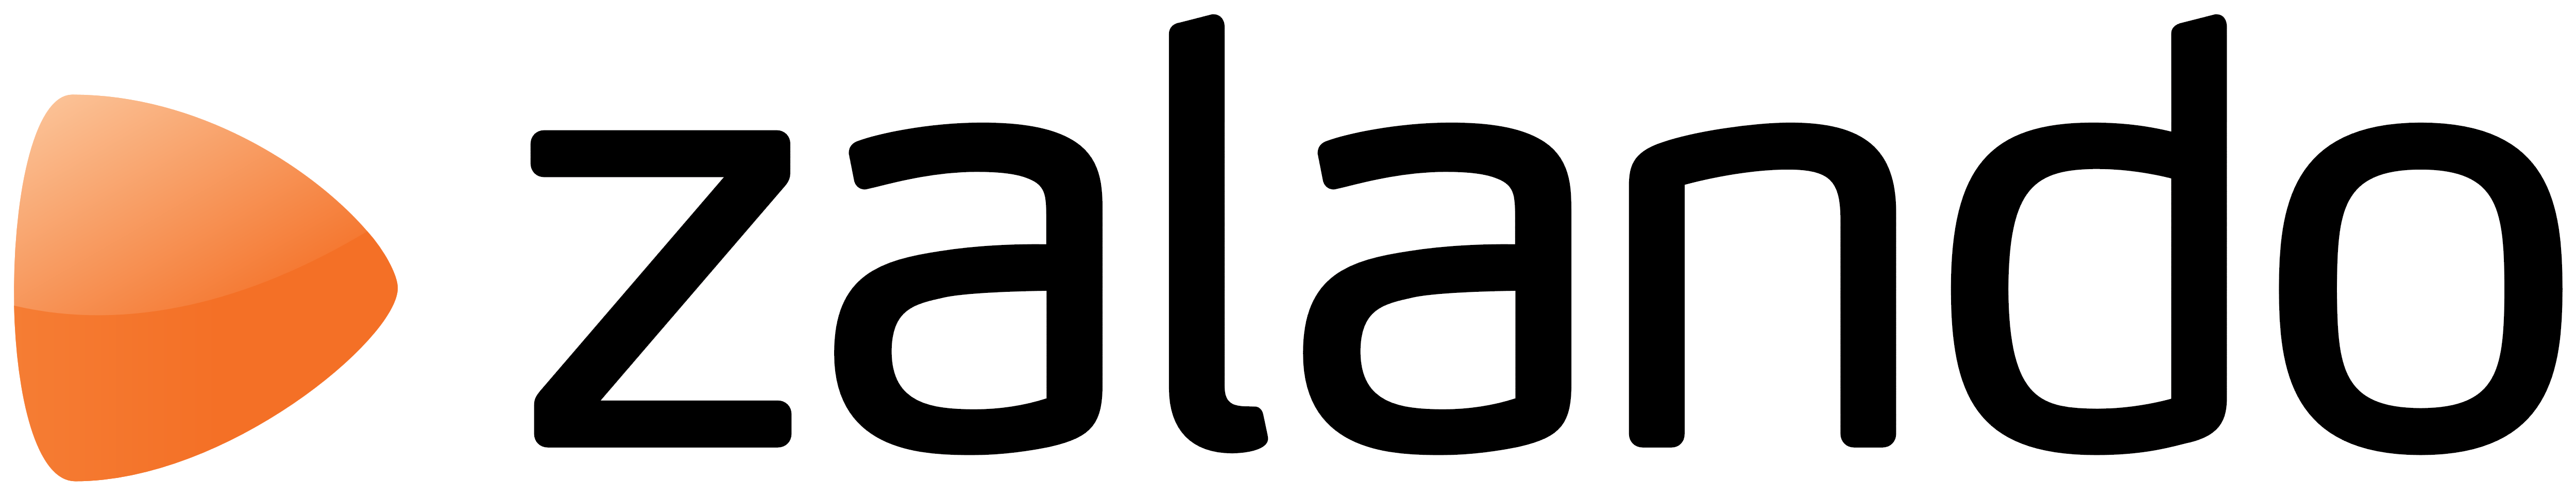 Zalando – Logos Download